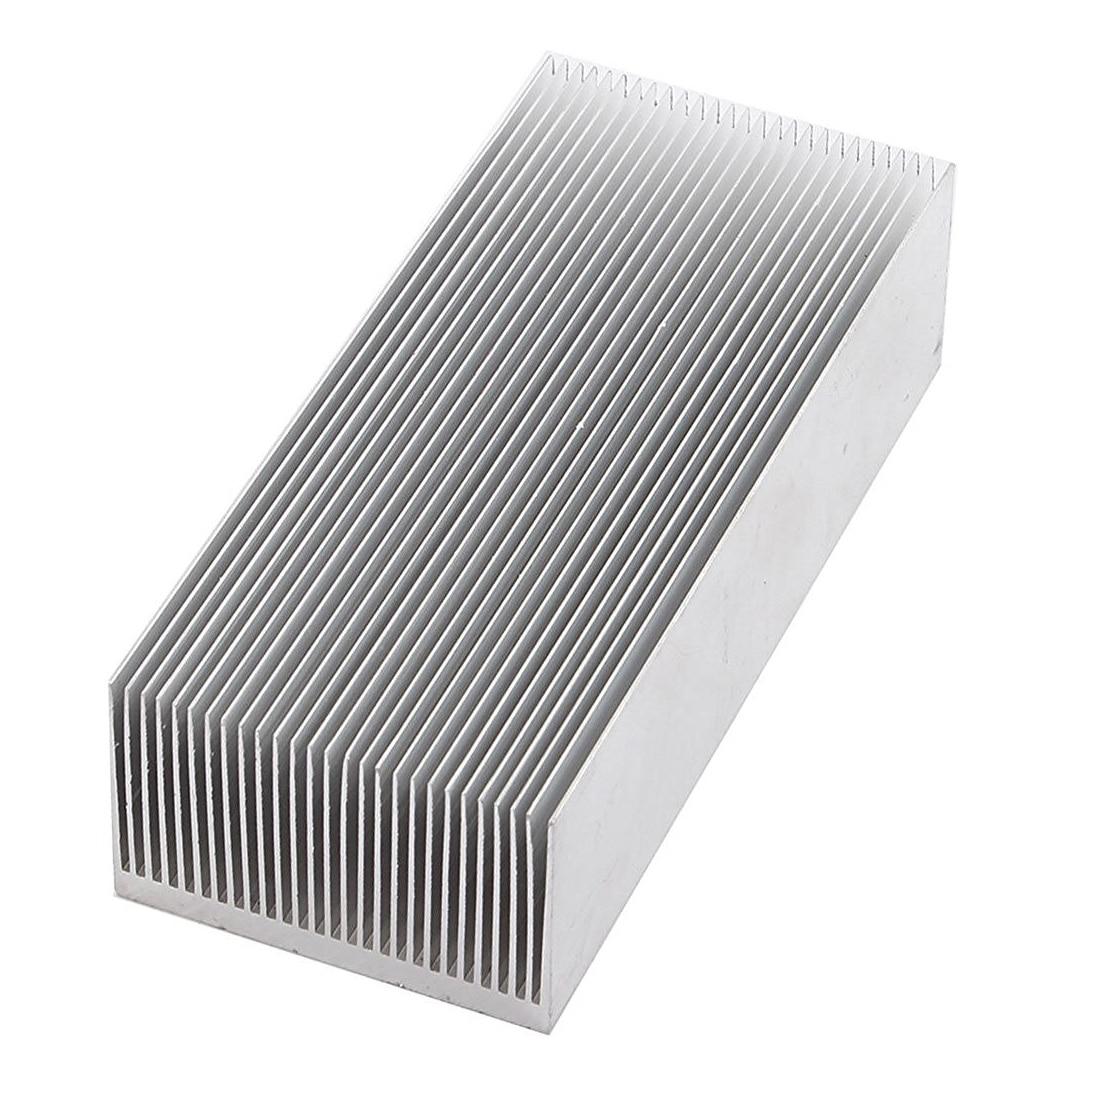 Aluminium Wärme Kühler Kühlkörper Kühl Fin 150x69x37mm Silber Ton